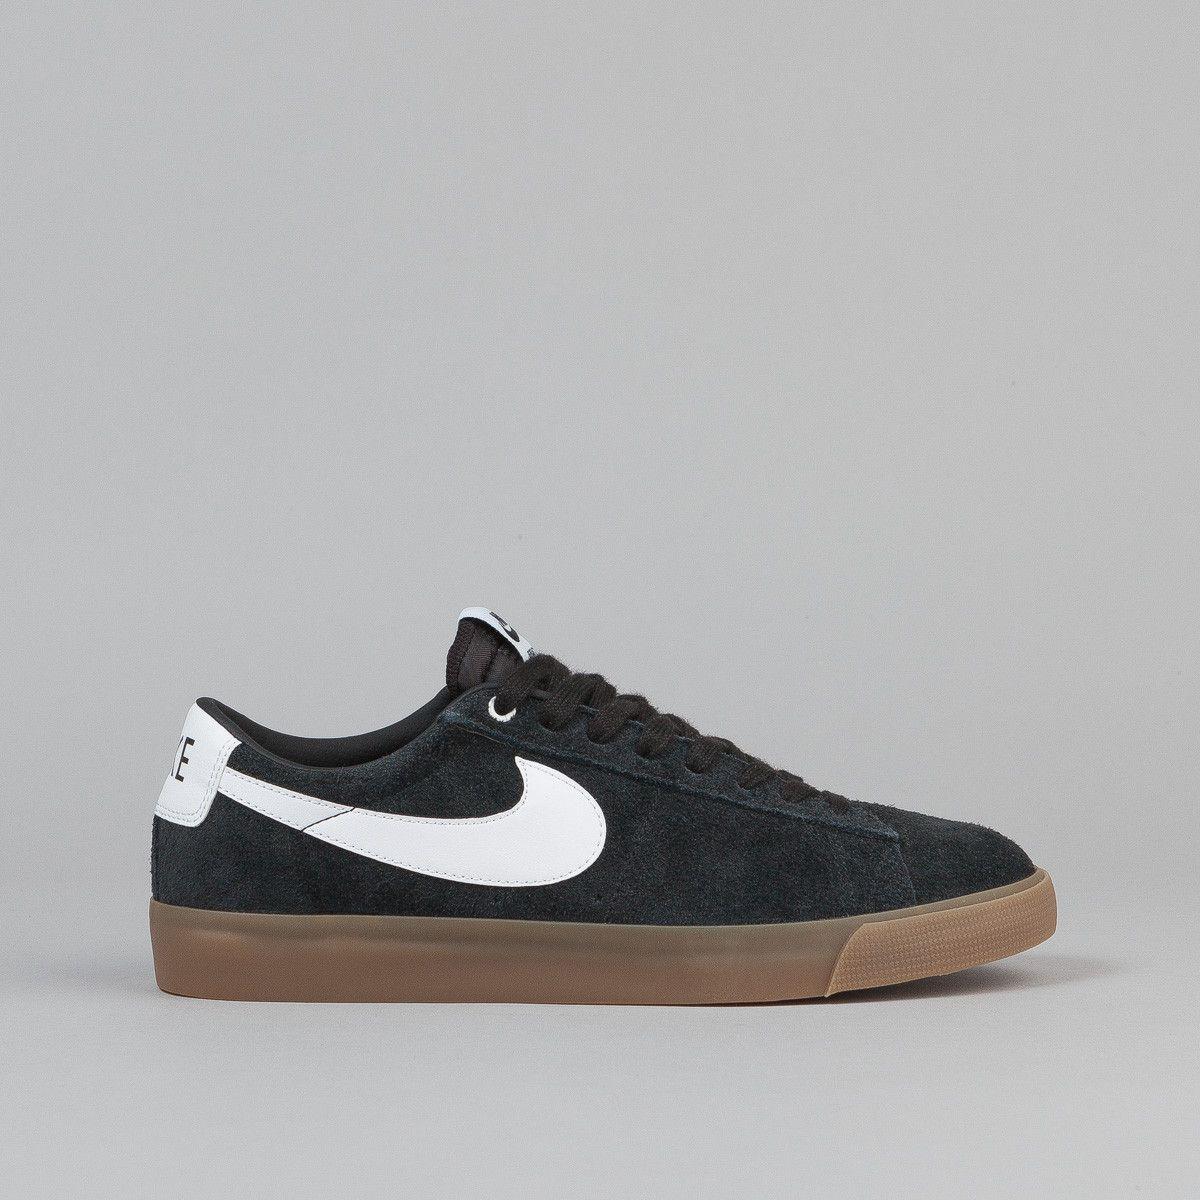 Nike Blazers Noir Et Or